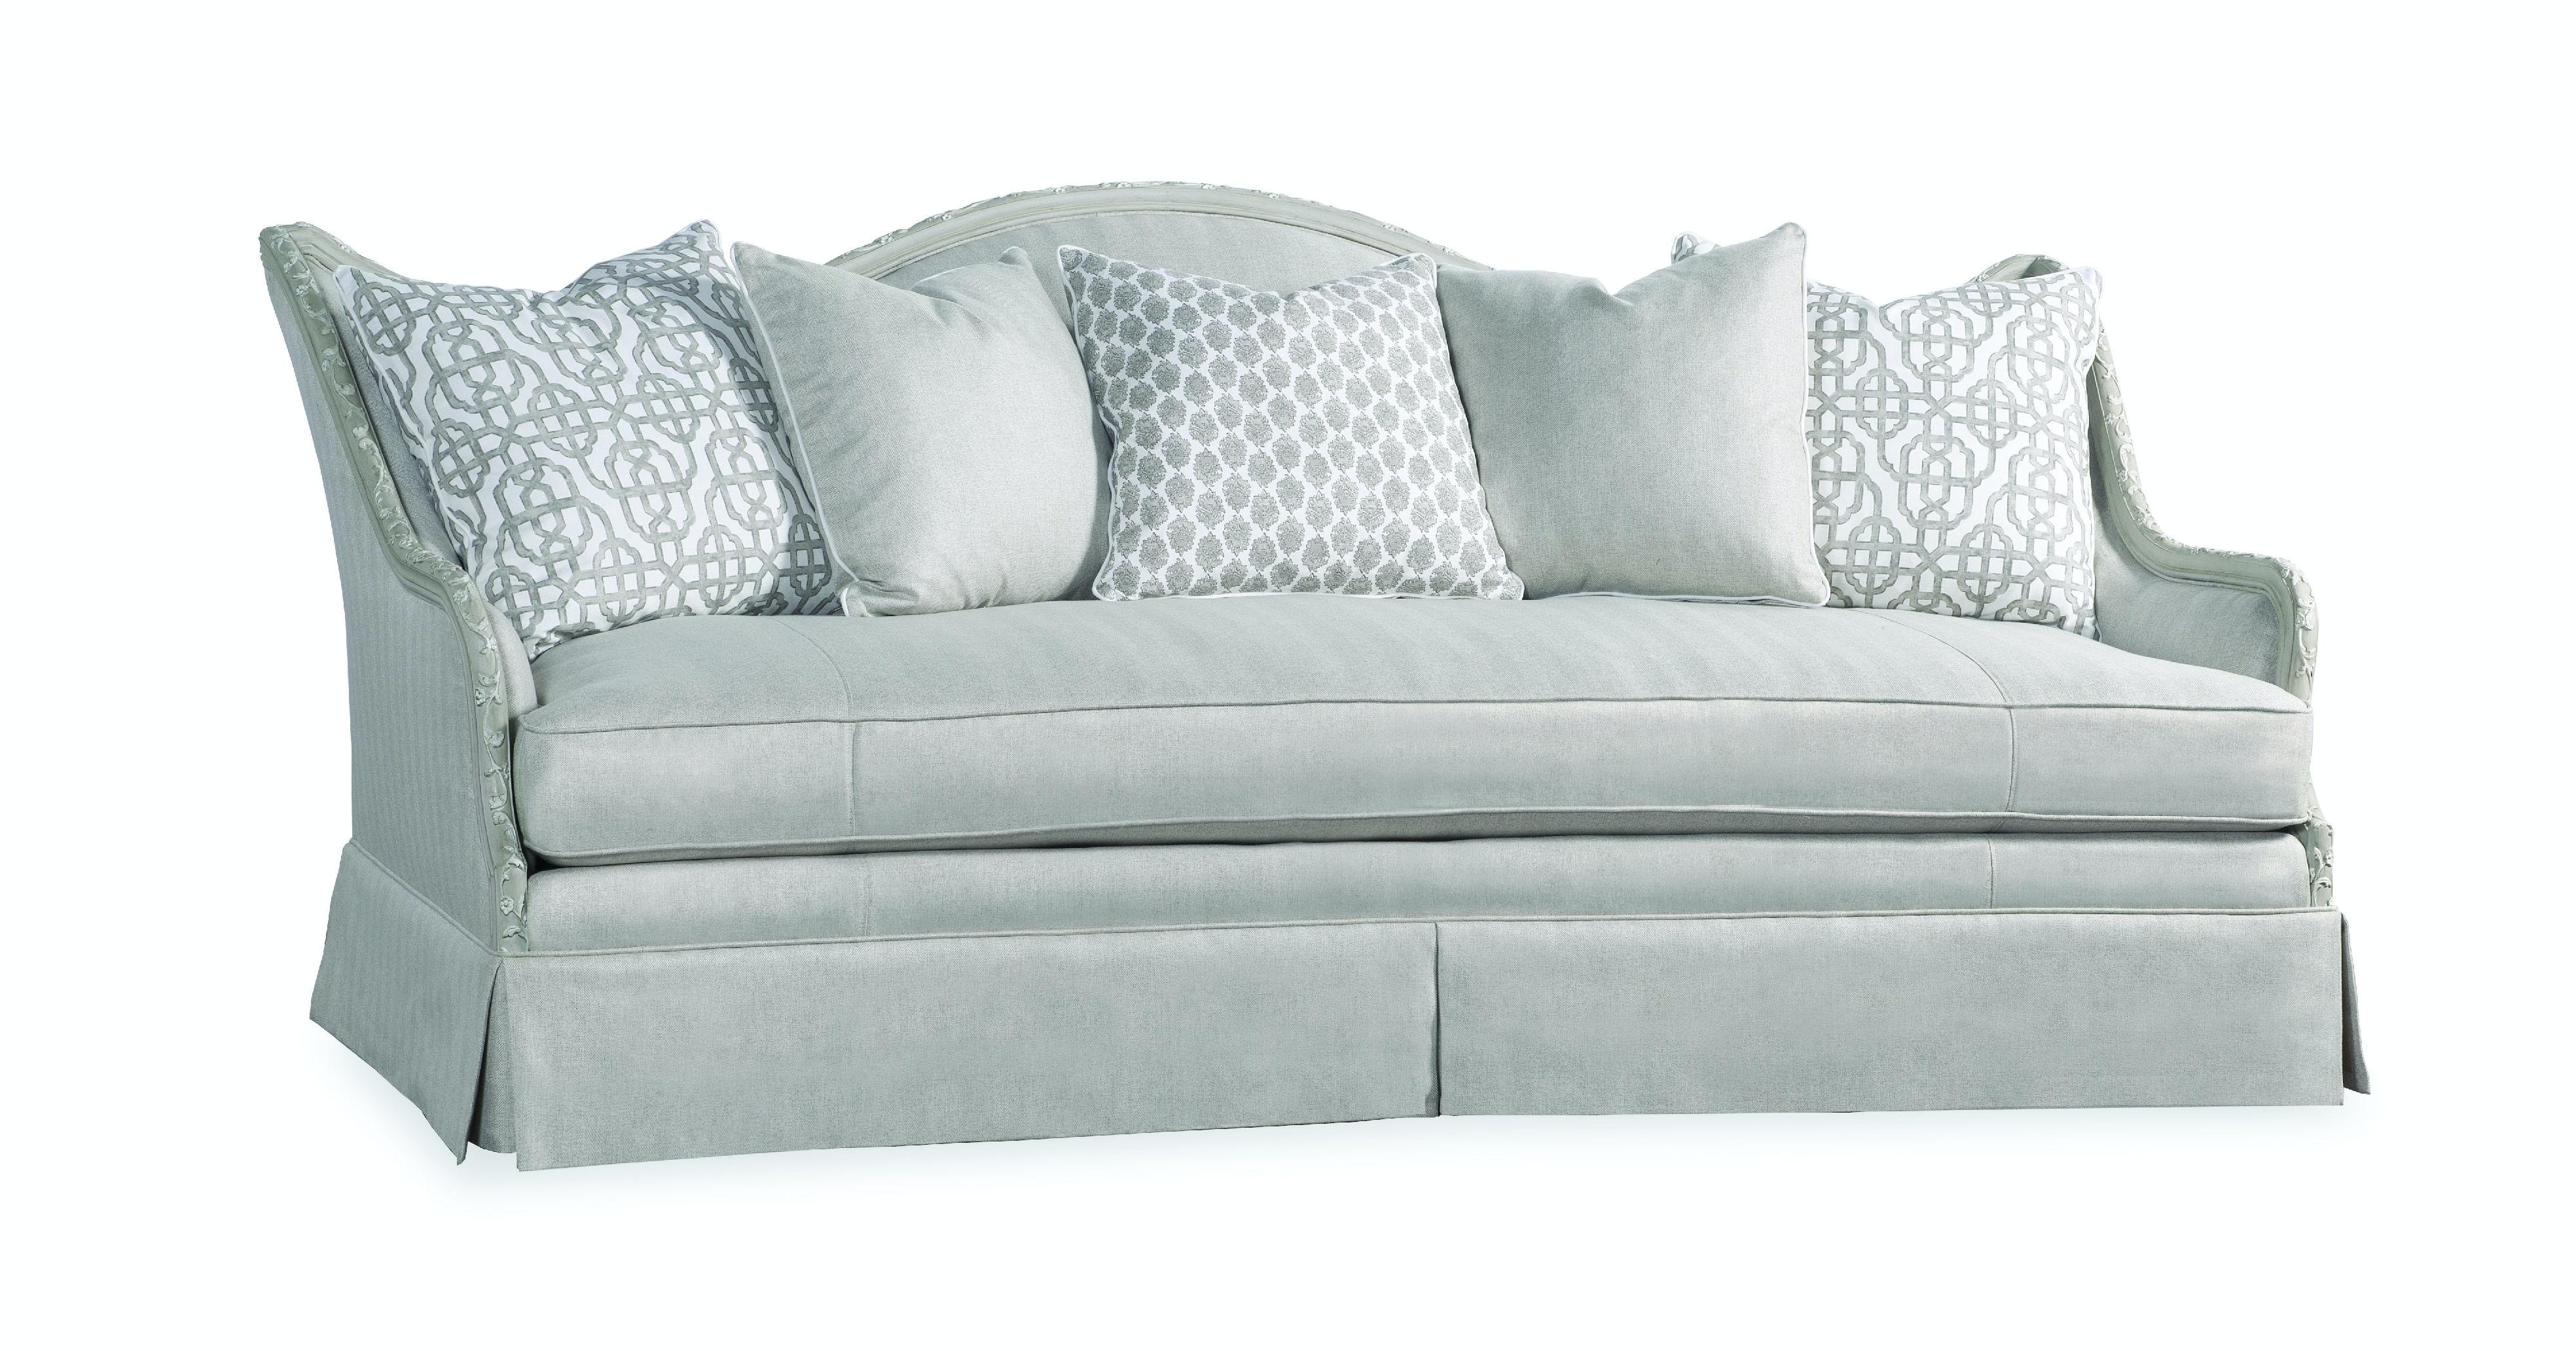 ART Furniture Sofa 513521 5011AA Part 63